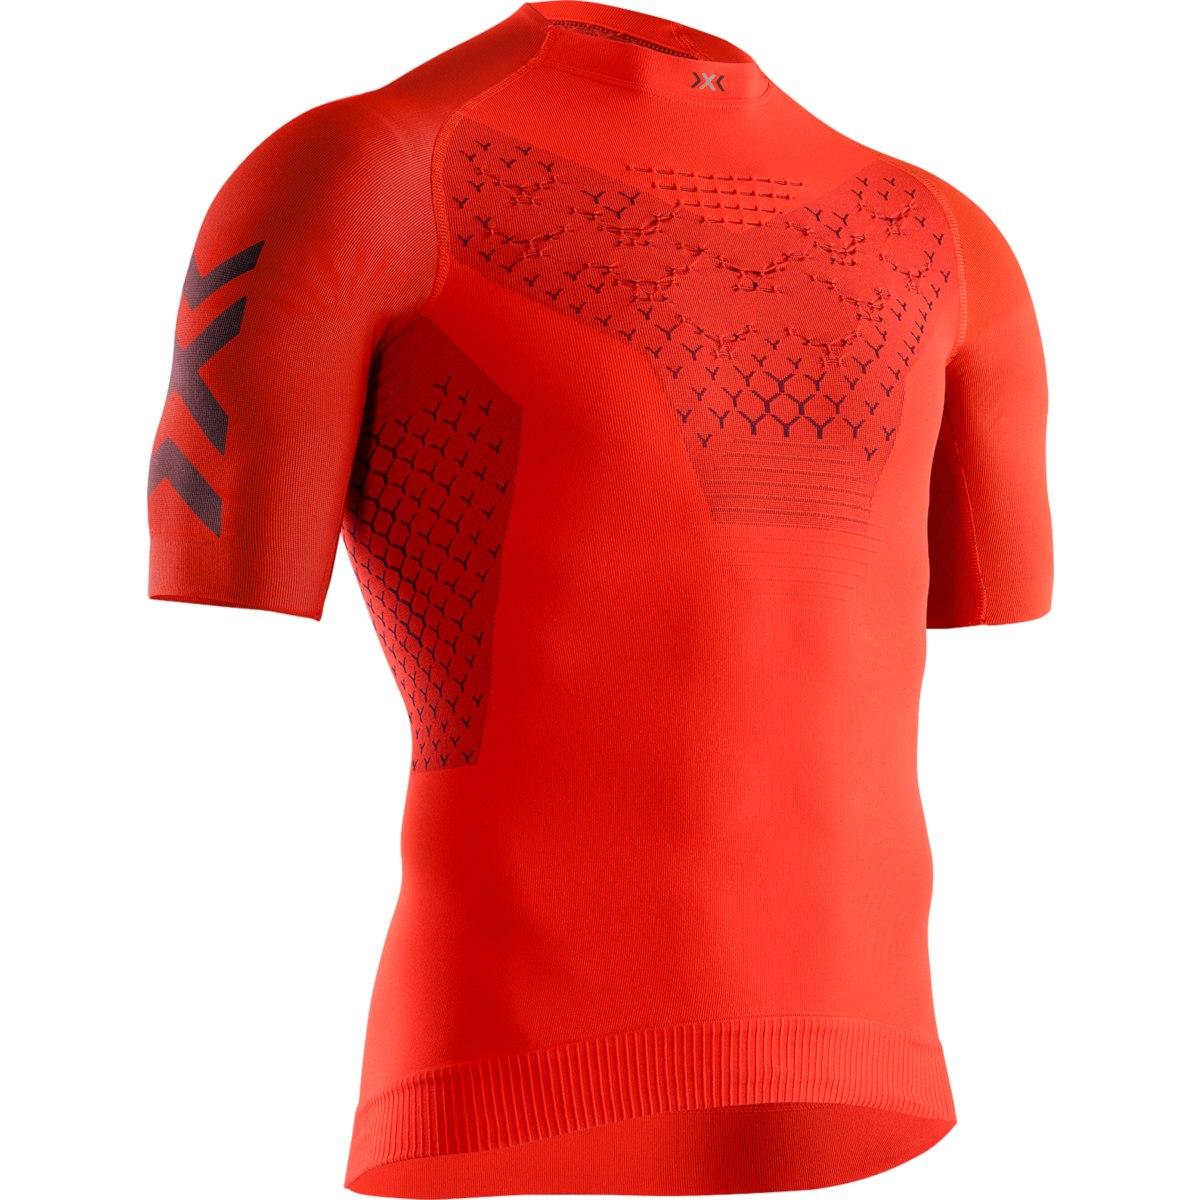 X-Bionic TWYCE 4.0 Run Shirt Short Sleeves for Men - sunset orange/teal blue